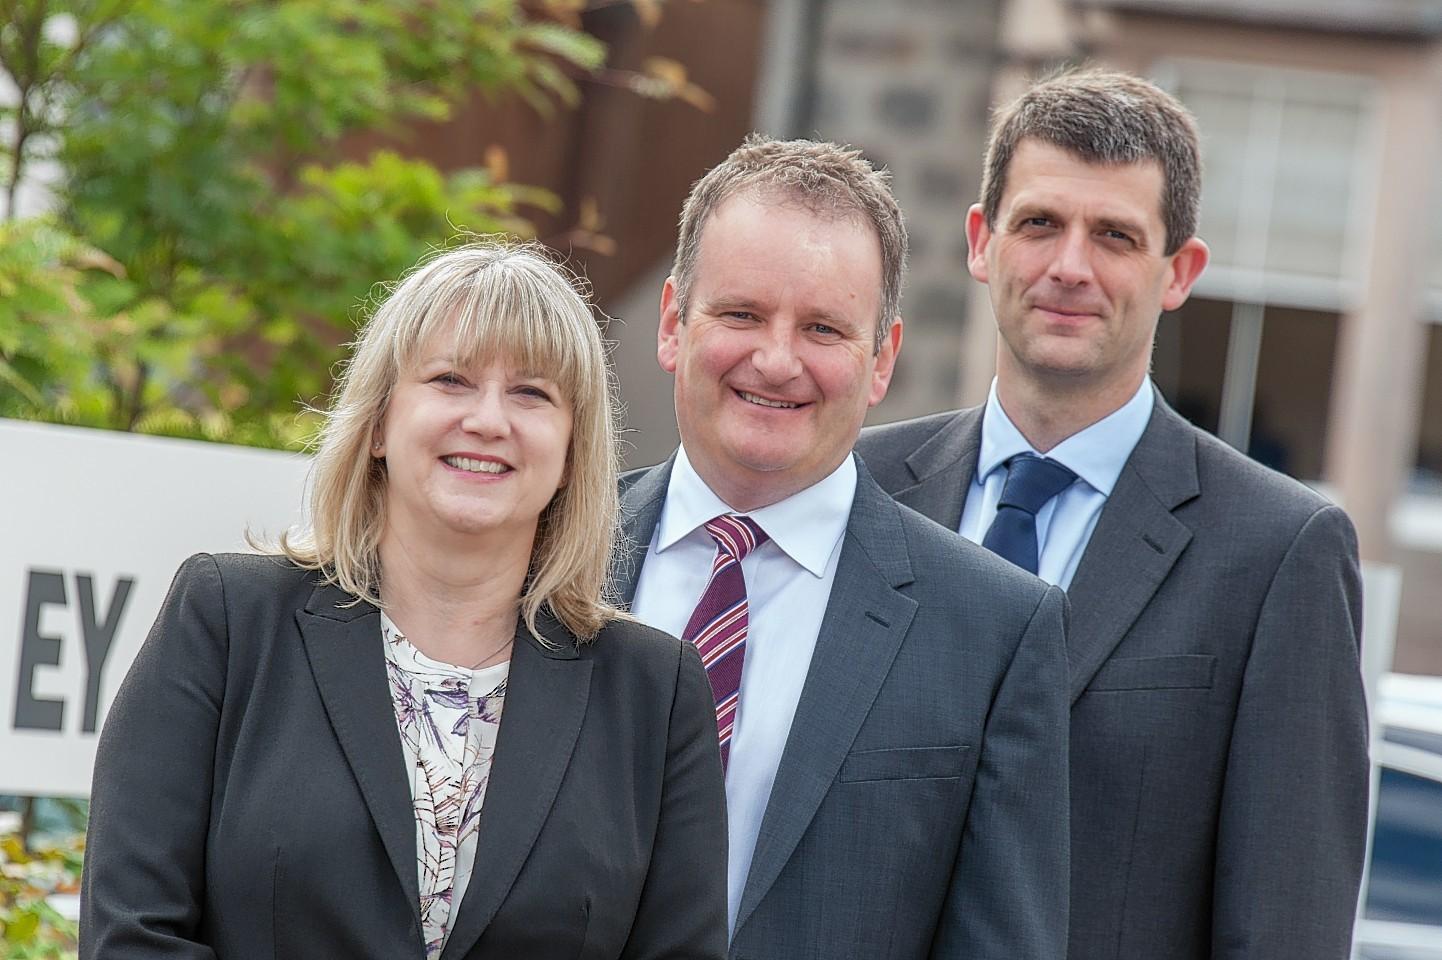 New Aberdeen EY partners Heather Smallwood and Jamie Dixon with Aberdeen senior partner Derek Leith (centre)